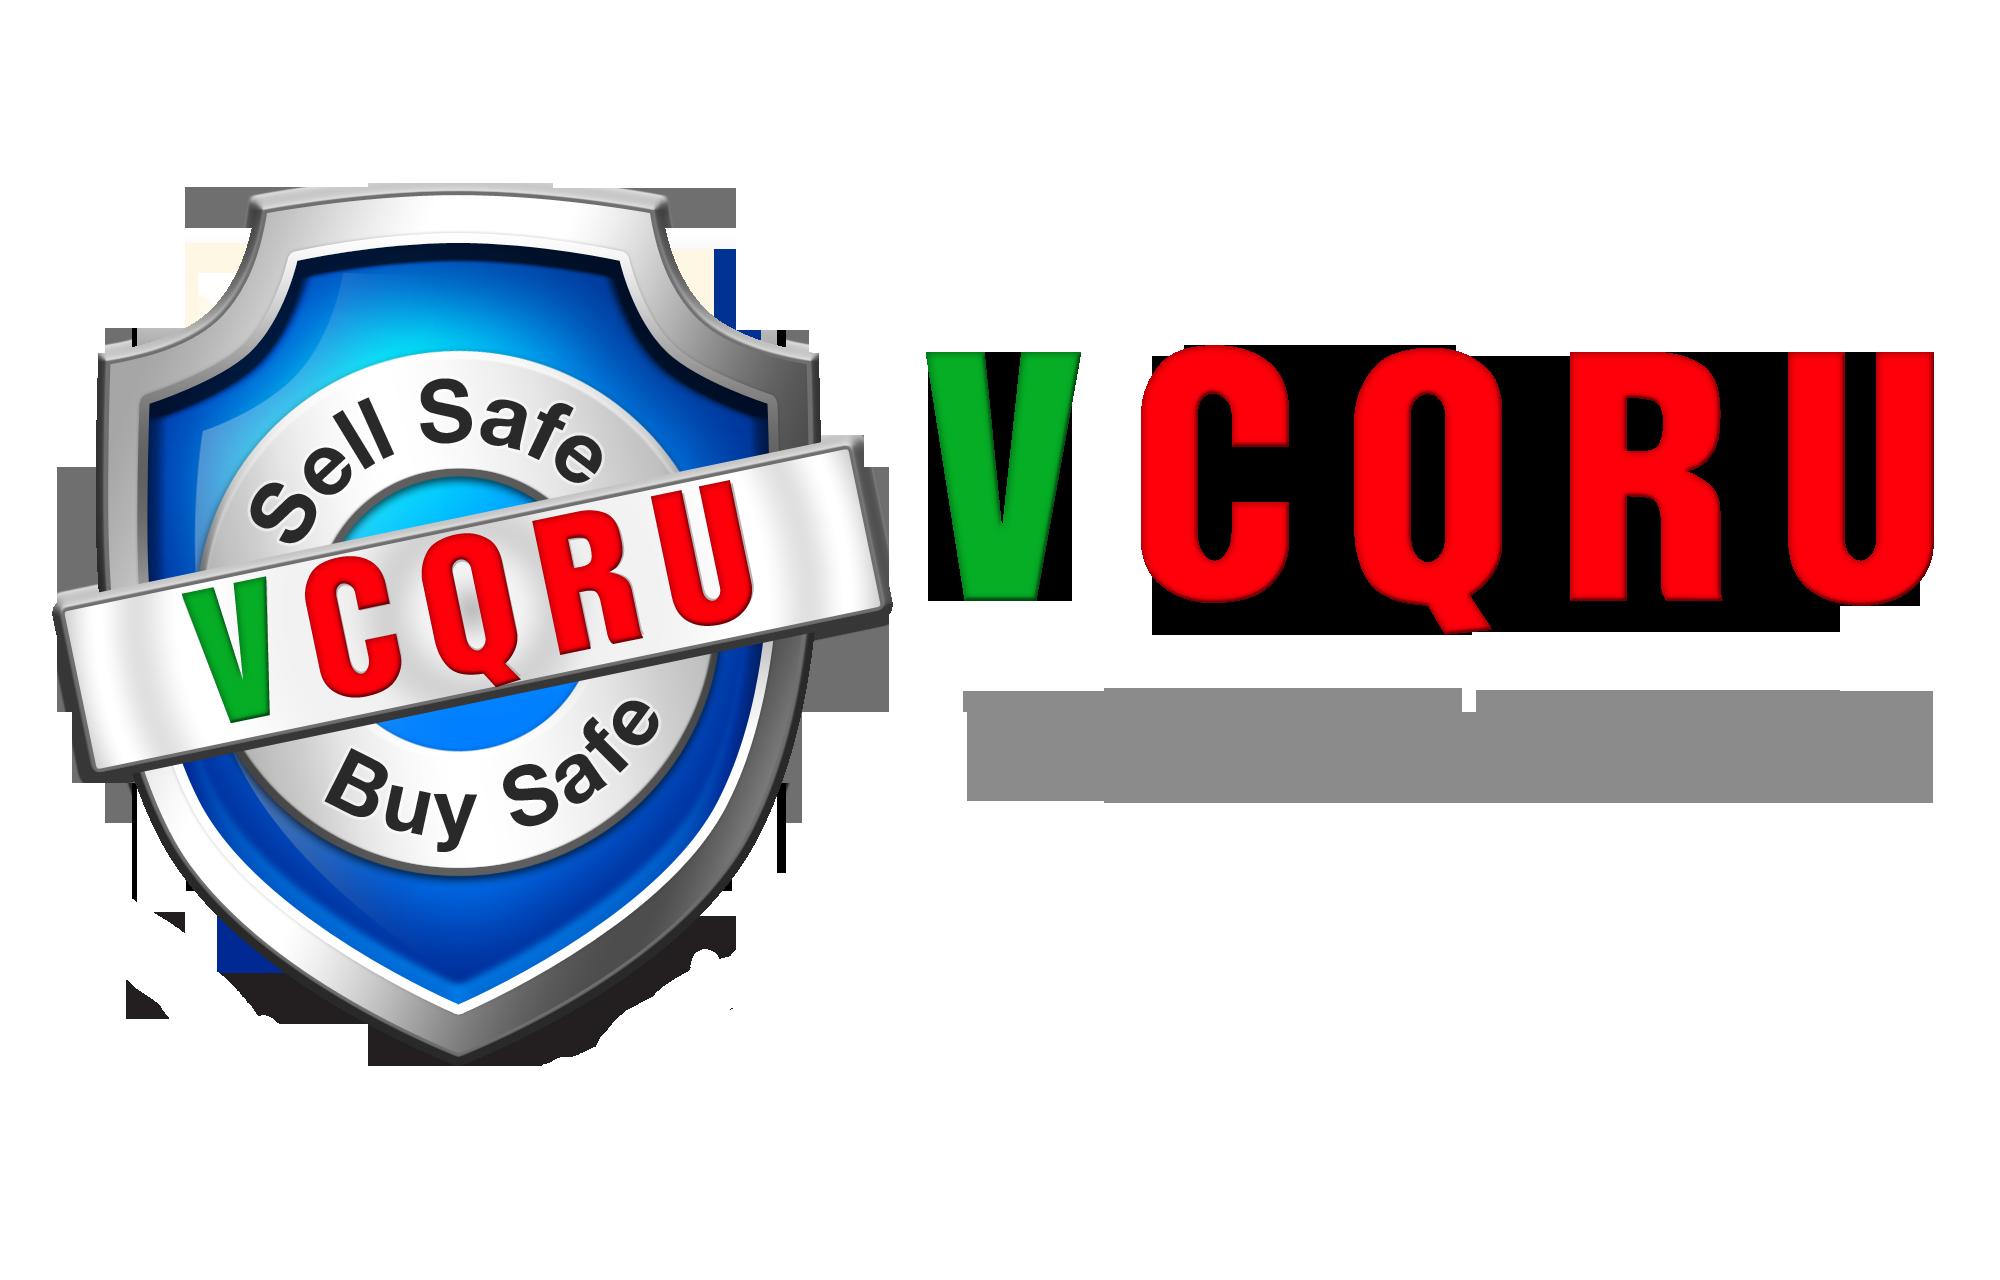 VCQRU We Secure You - Jobs For Women